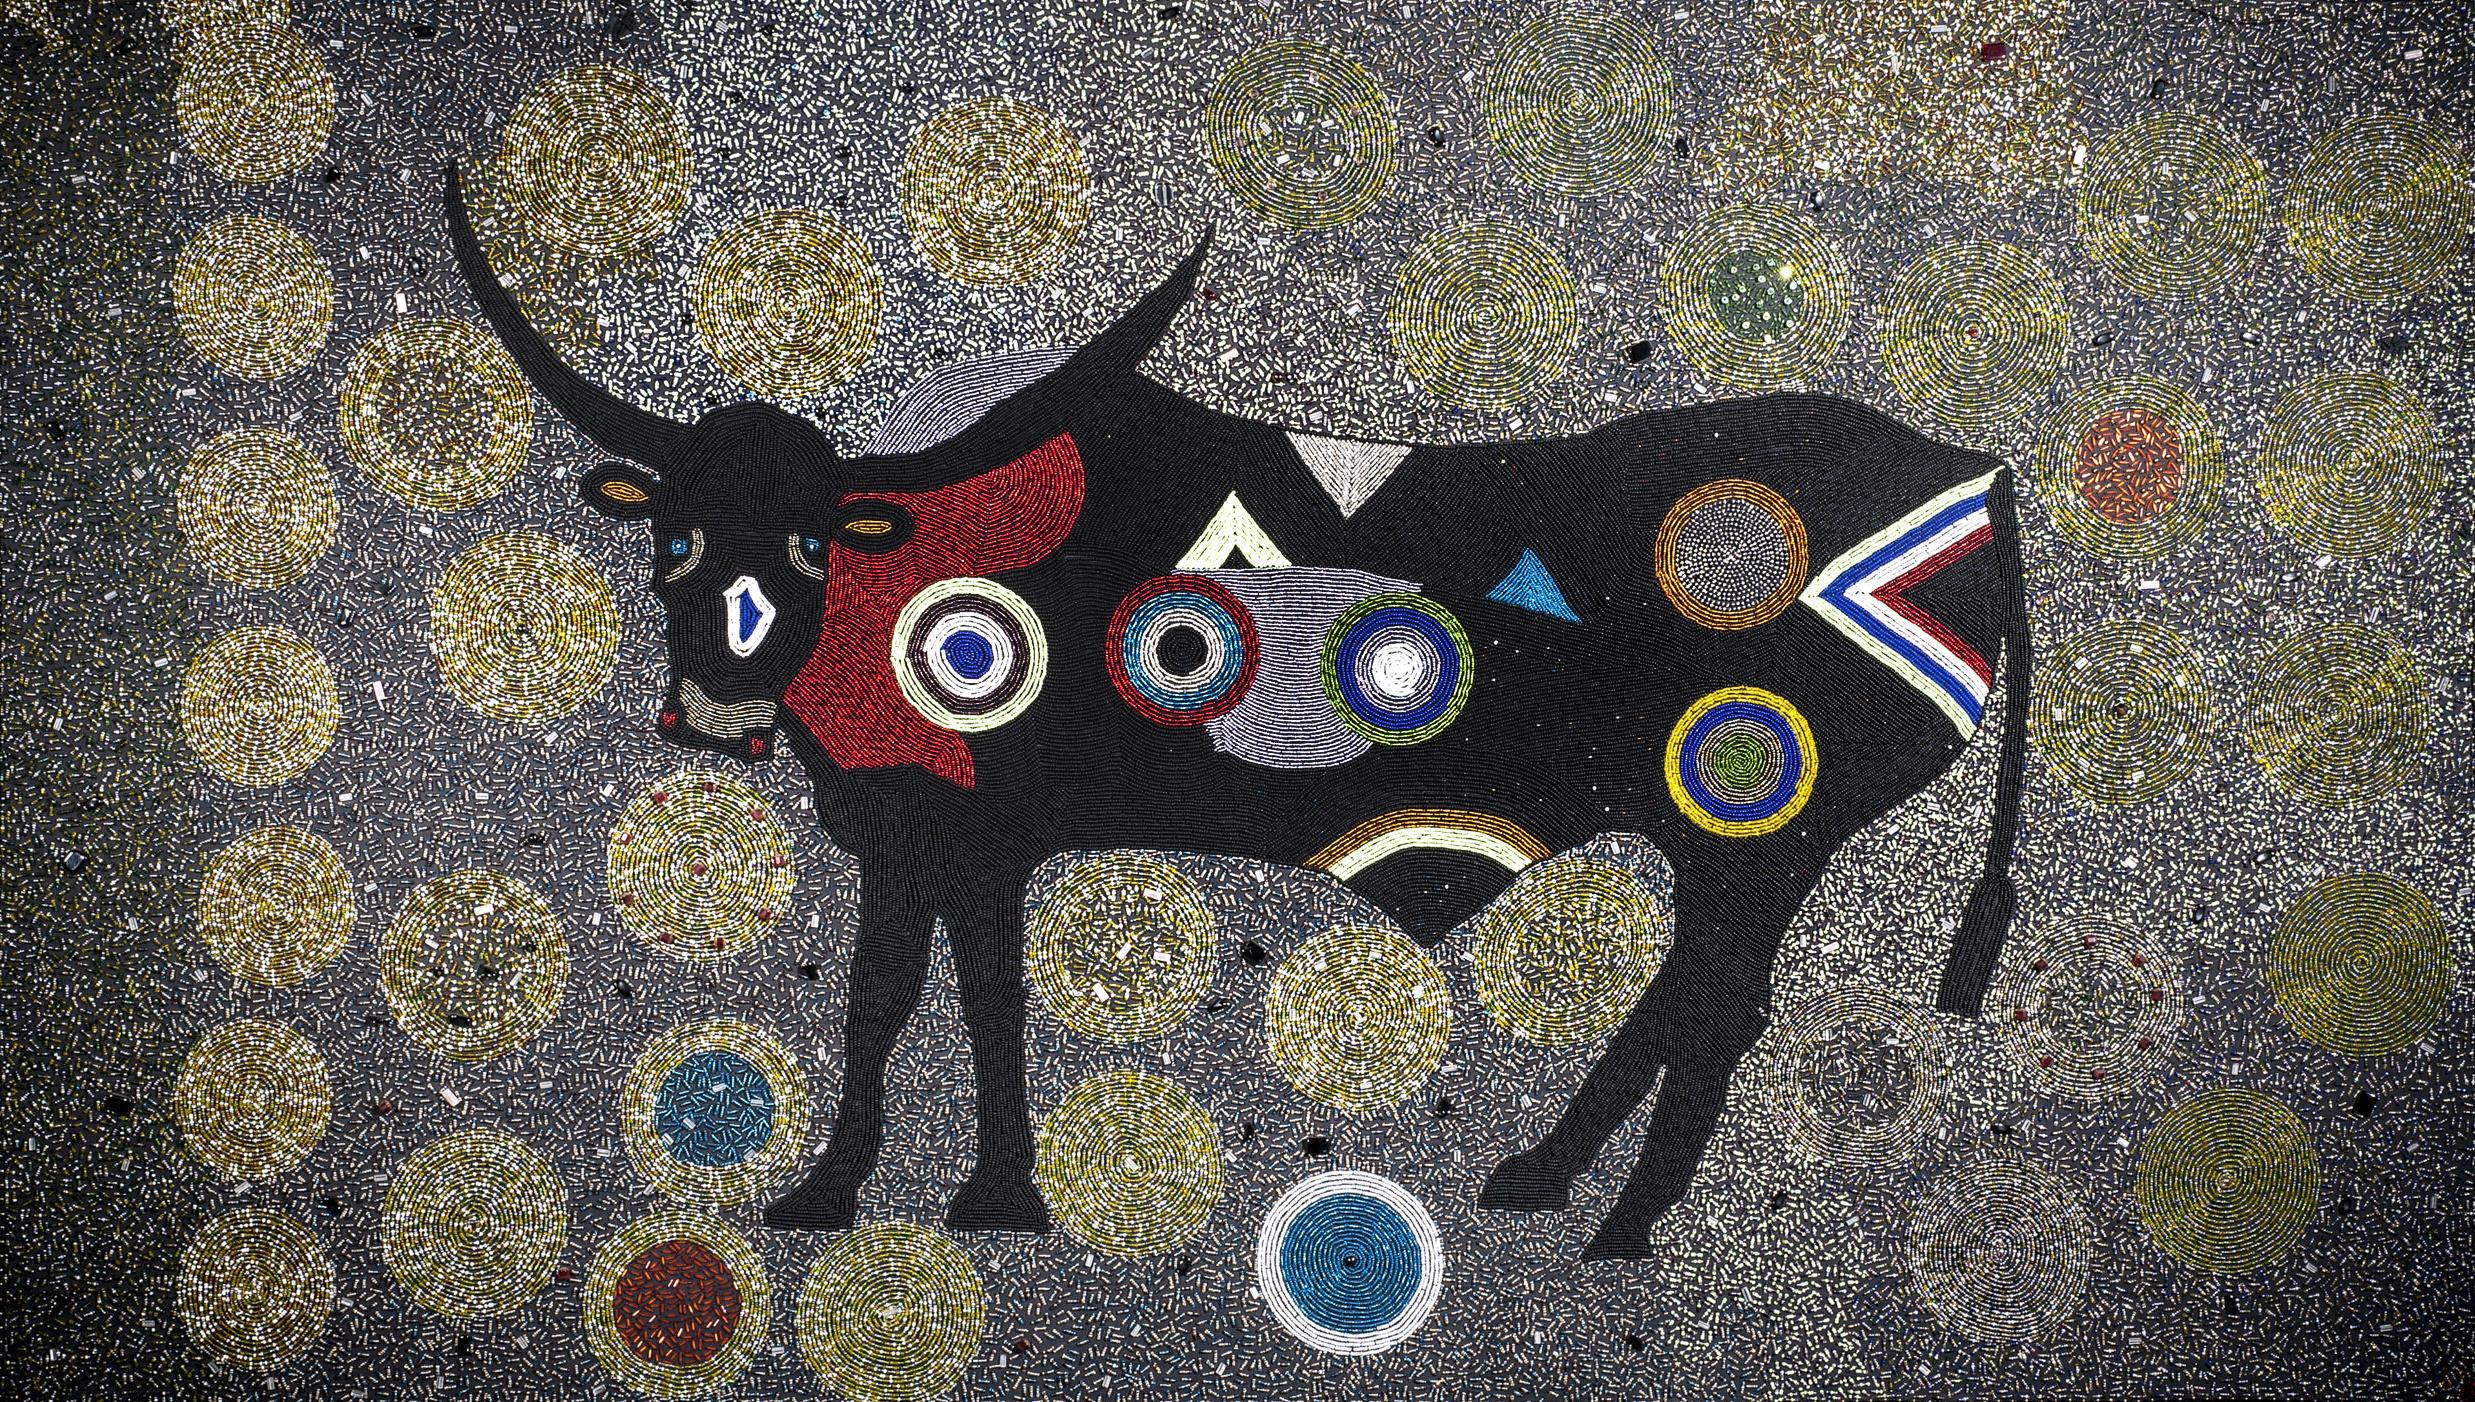 Ubuhle Women: Beadwork and the Art of Independence.Bongiswa Ntobela (South African, 1973?2009)Funky Bull, 2006Glass beads sewn onto fabricThe Ubuhle Private Collection